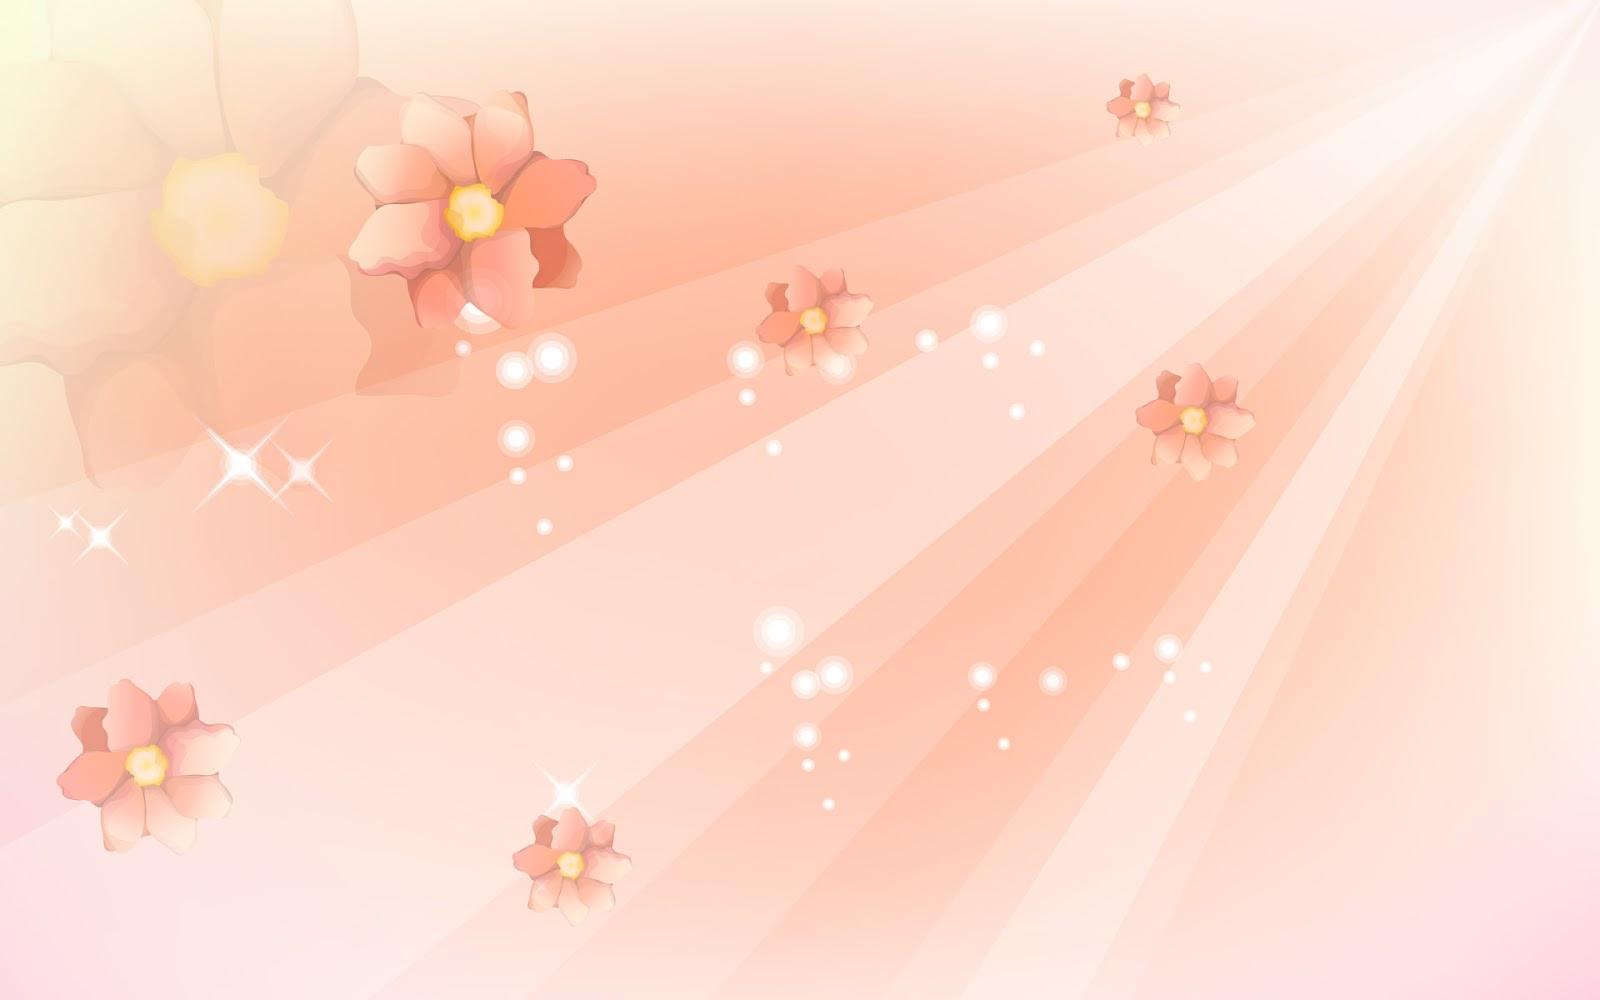 Bunga Animasi Bergerak - Kumpulan Kata dan Gambar